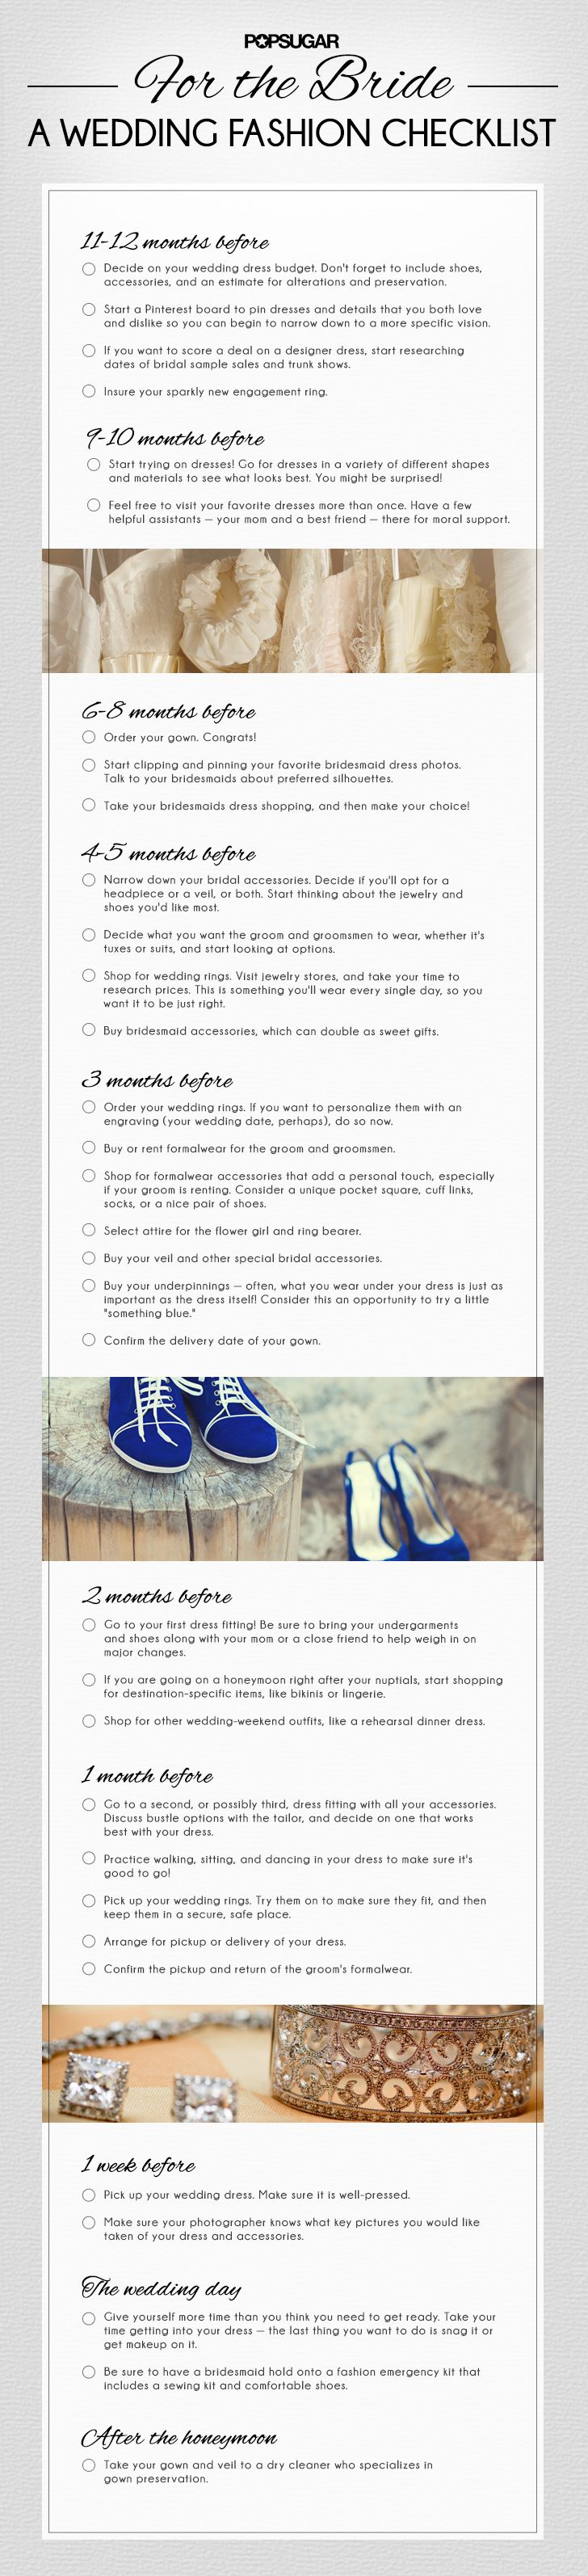 The Ultimate Wedding Fashion Checklist